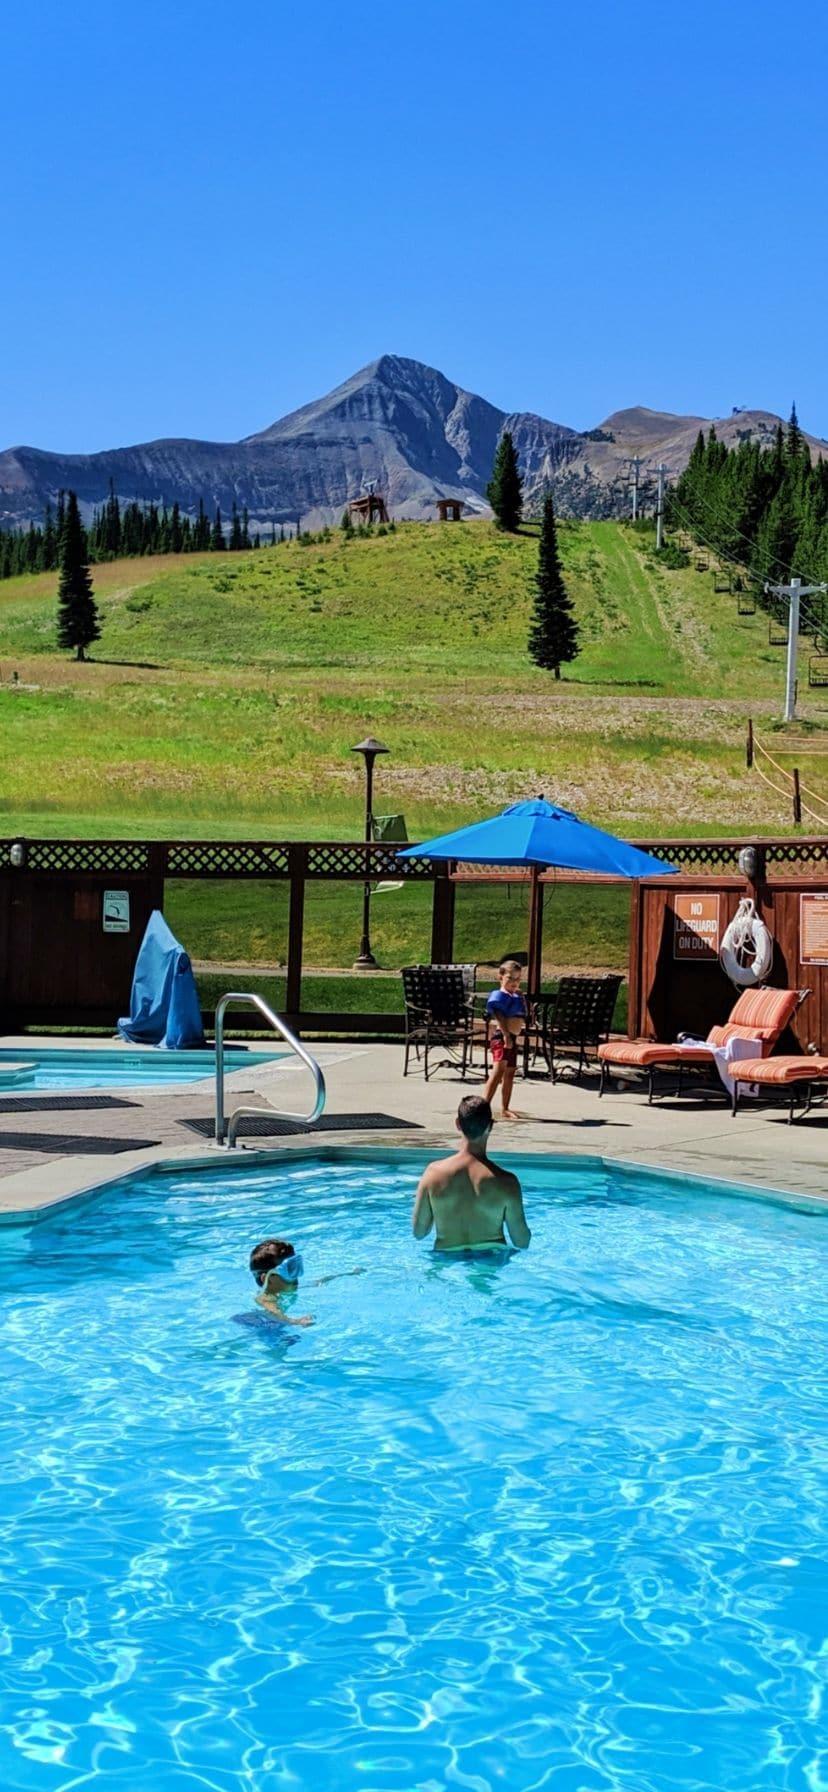 Mountain View Swimming Pool at Big Sky Resort Big Sky Montana